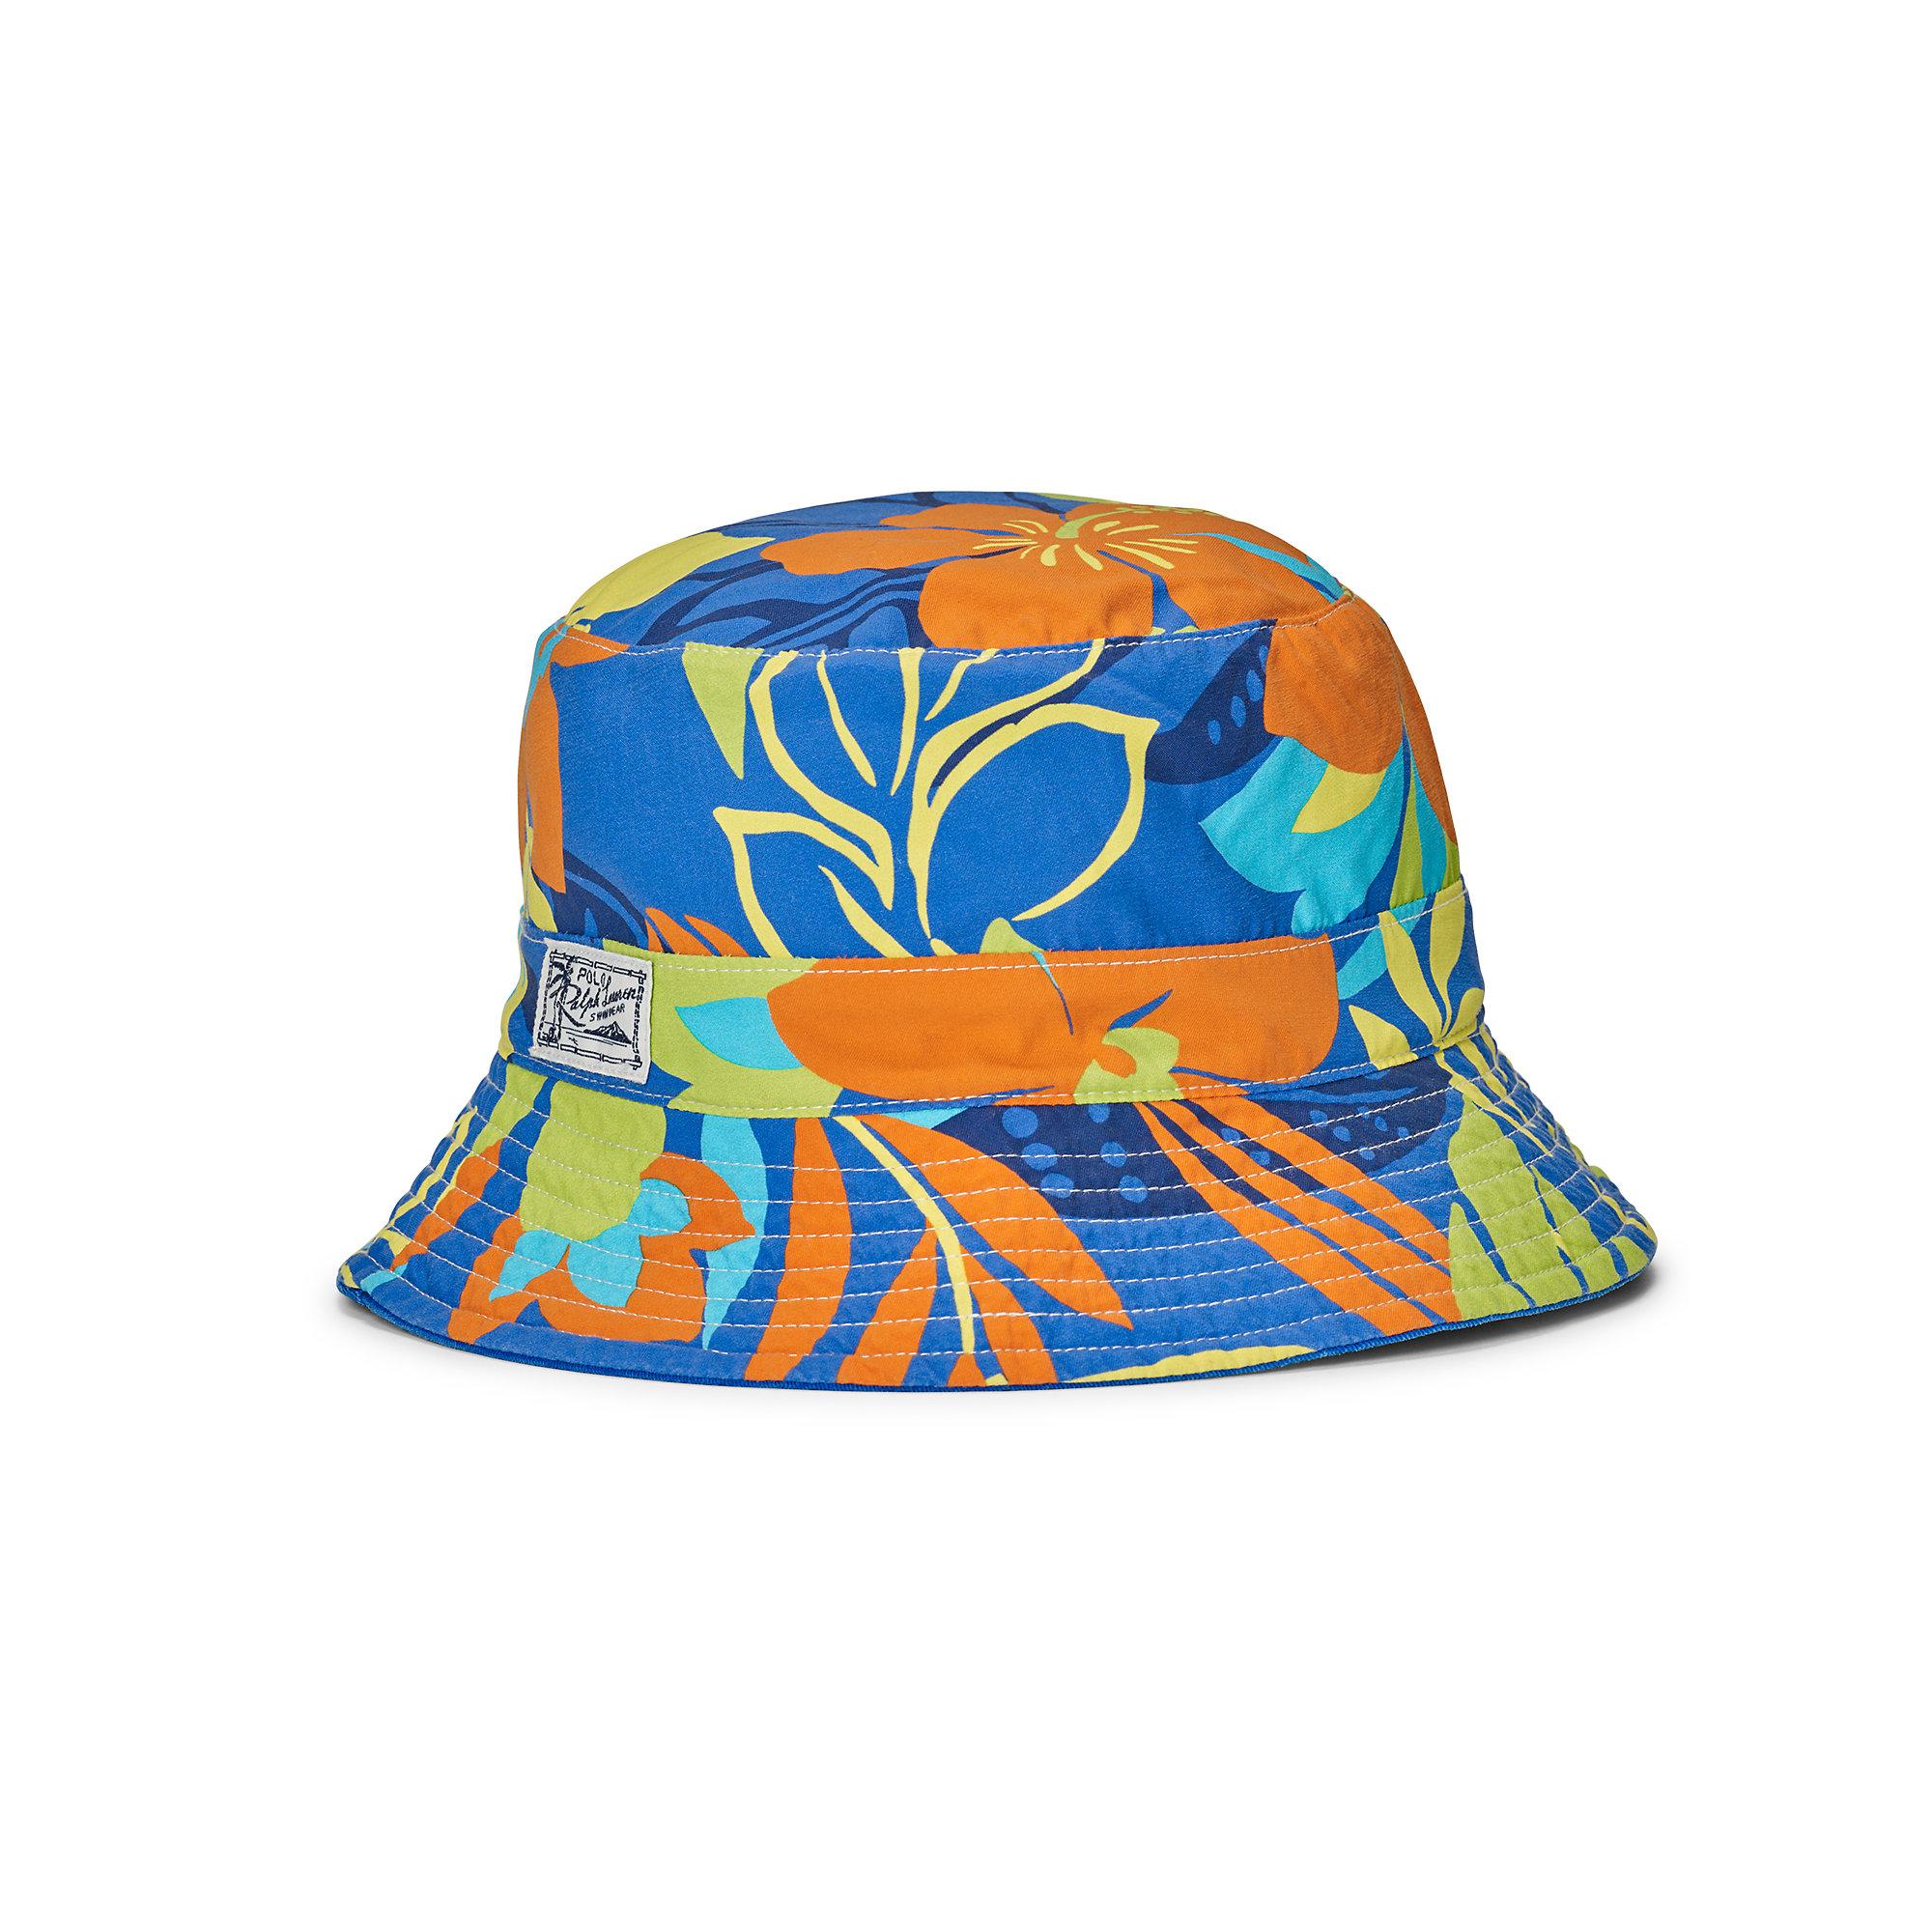 Lyst - Polo Ralph Lauren Reversible Twill Bucket Hat for Men 234d472e047b